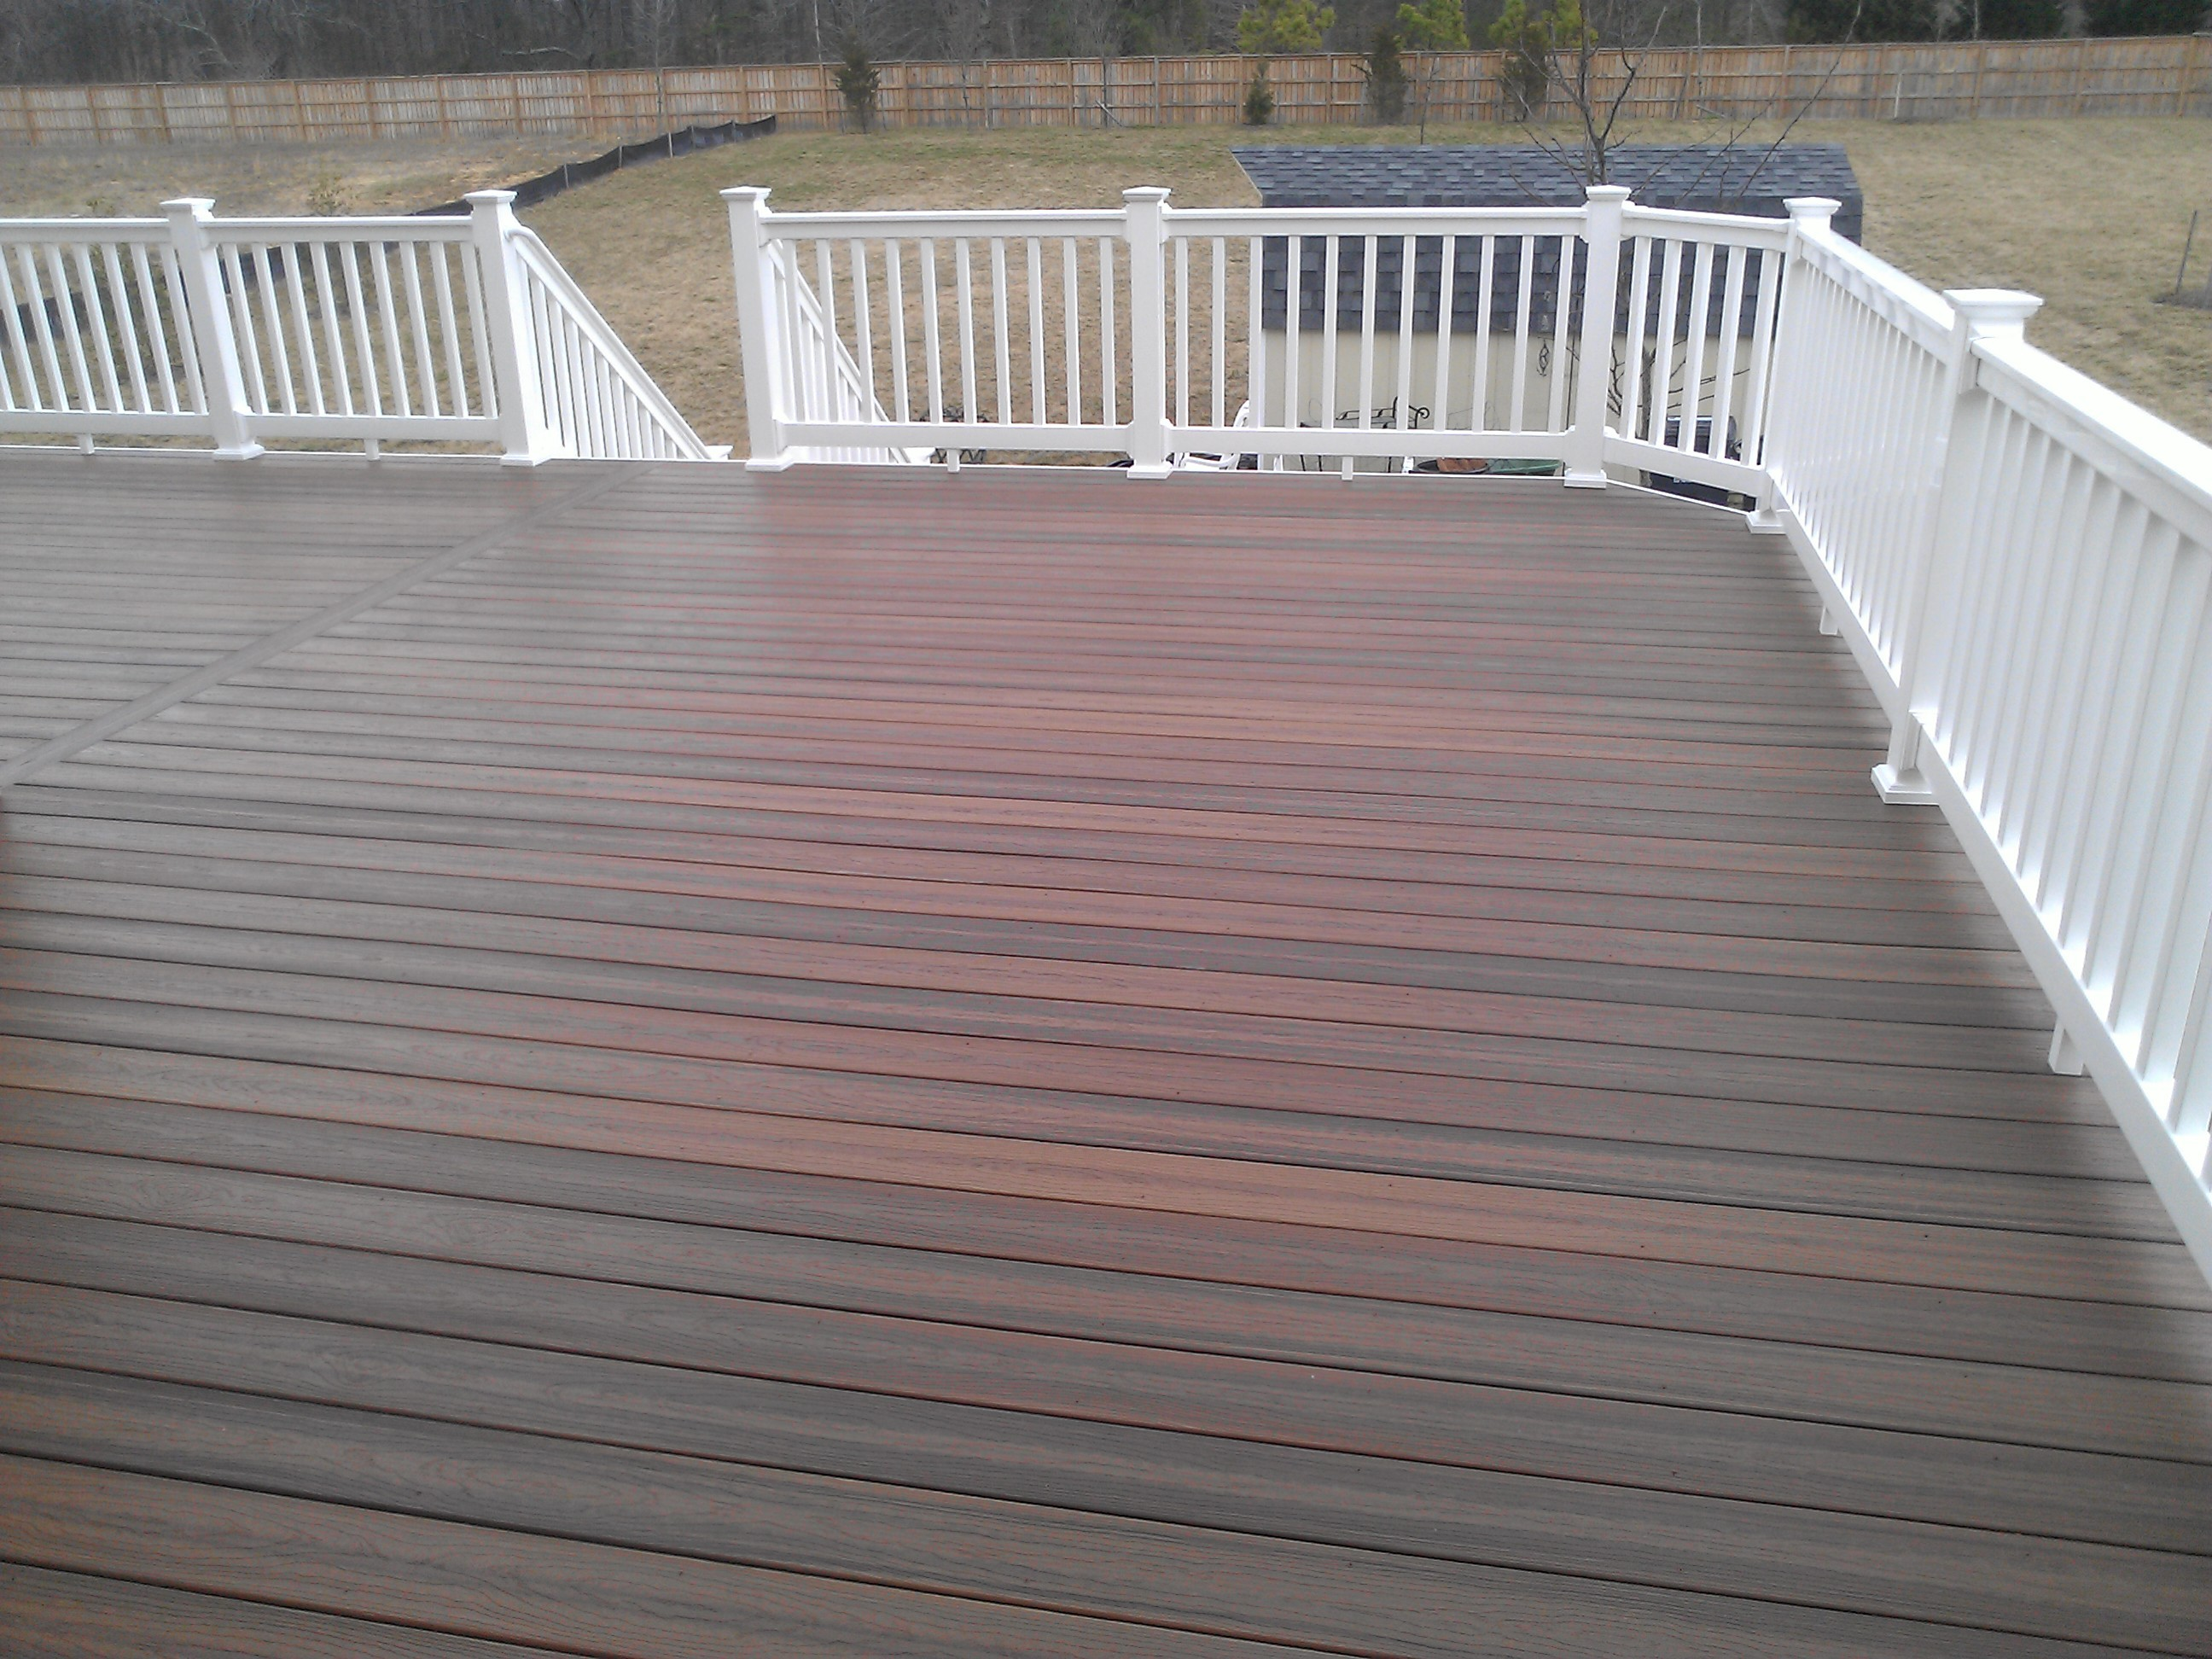 Deck Builders In Upper Marlboro, MD